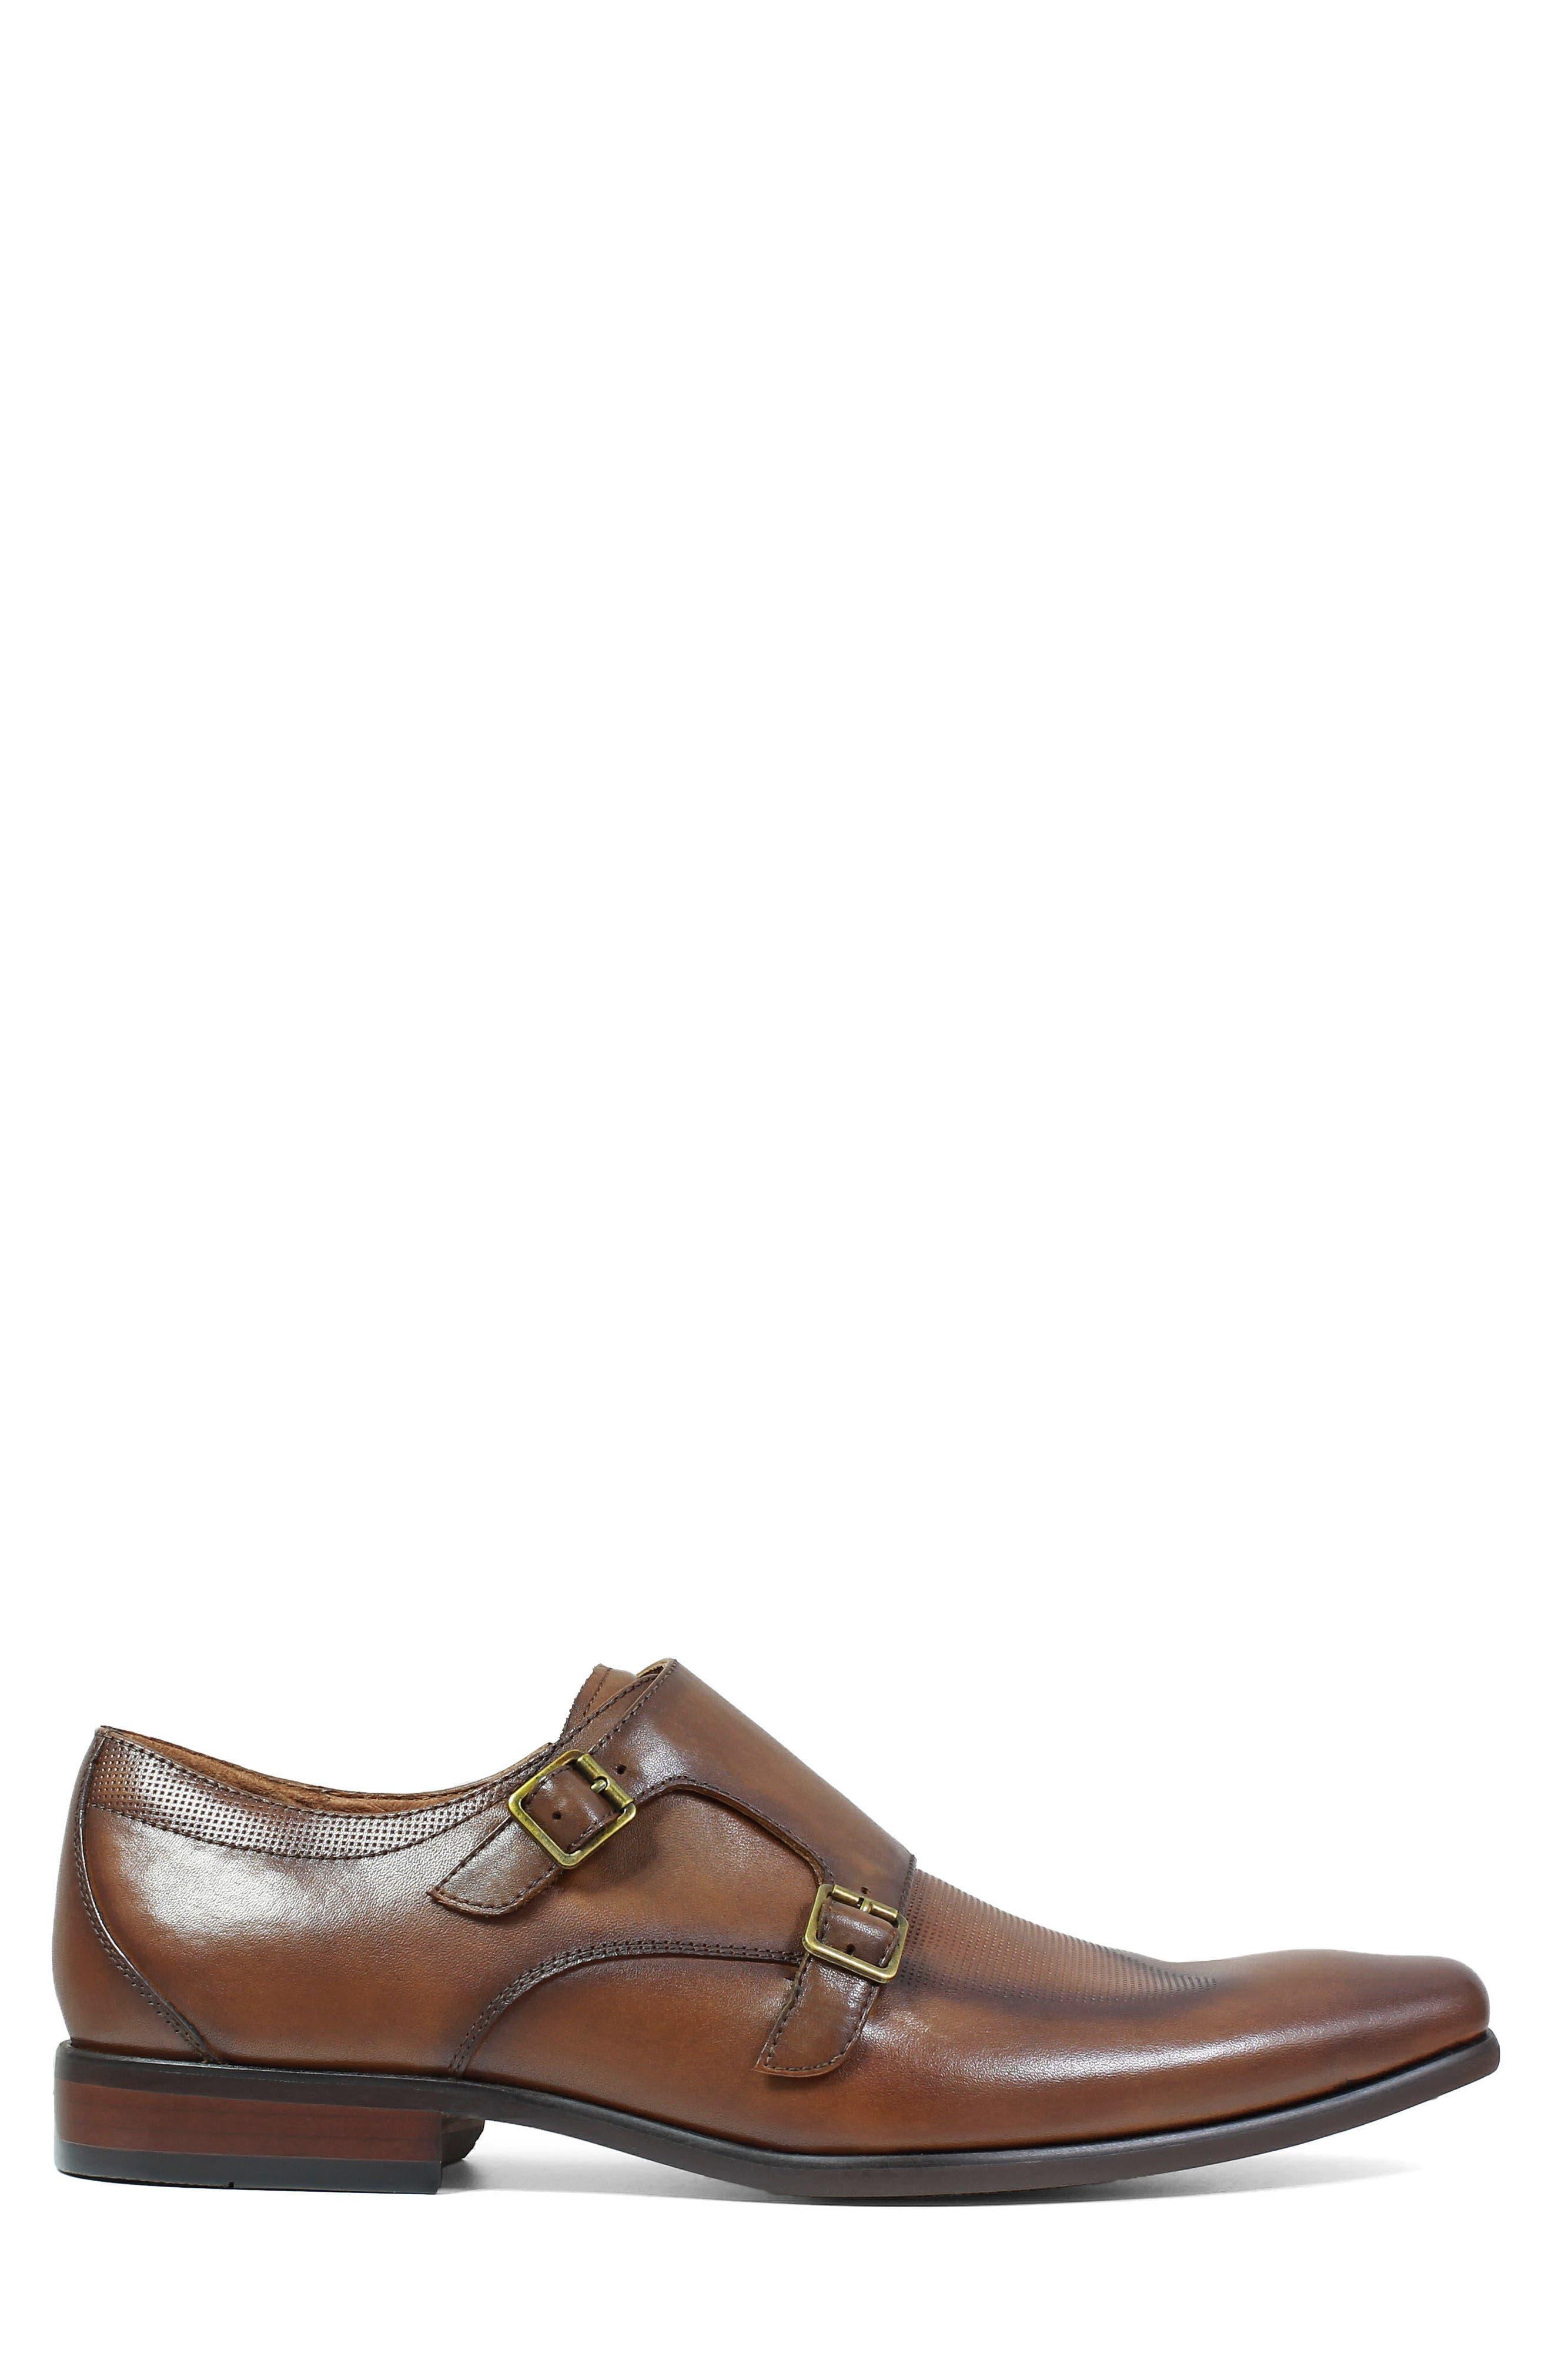 Postino Textured Double Strap Monk Shoe,                             Alternate thumbnail 3, color,                             Cognac Leather